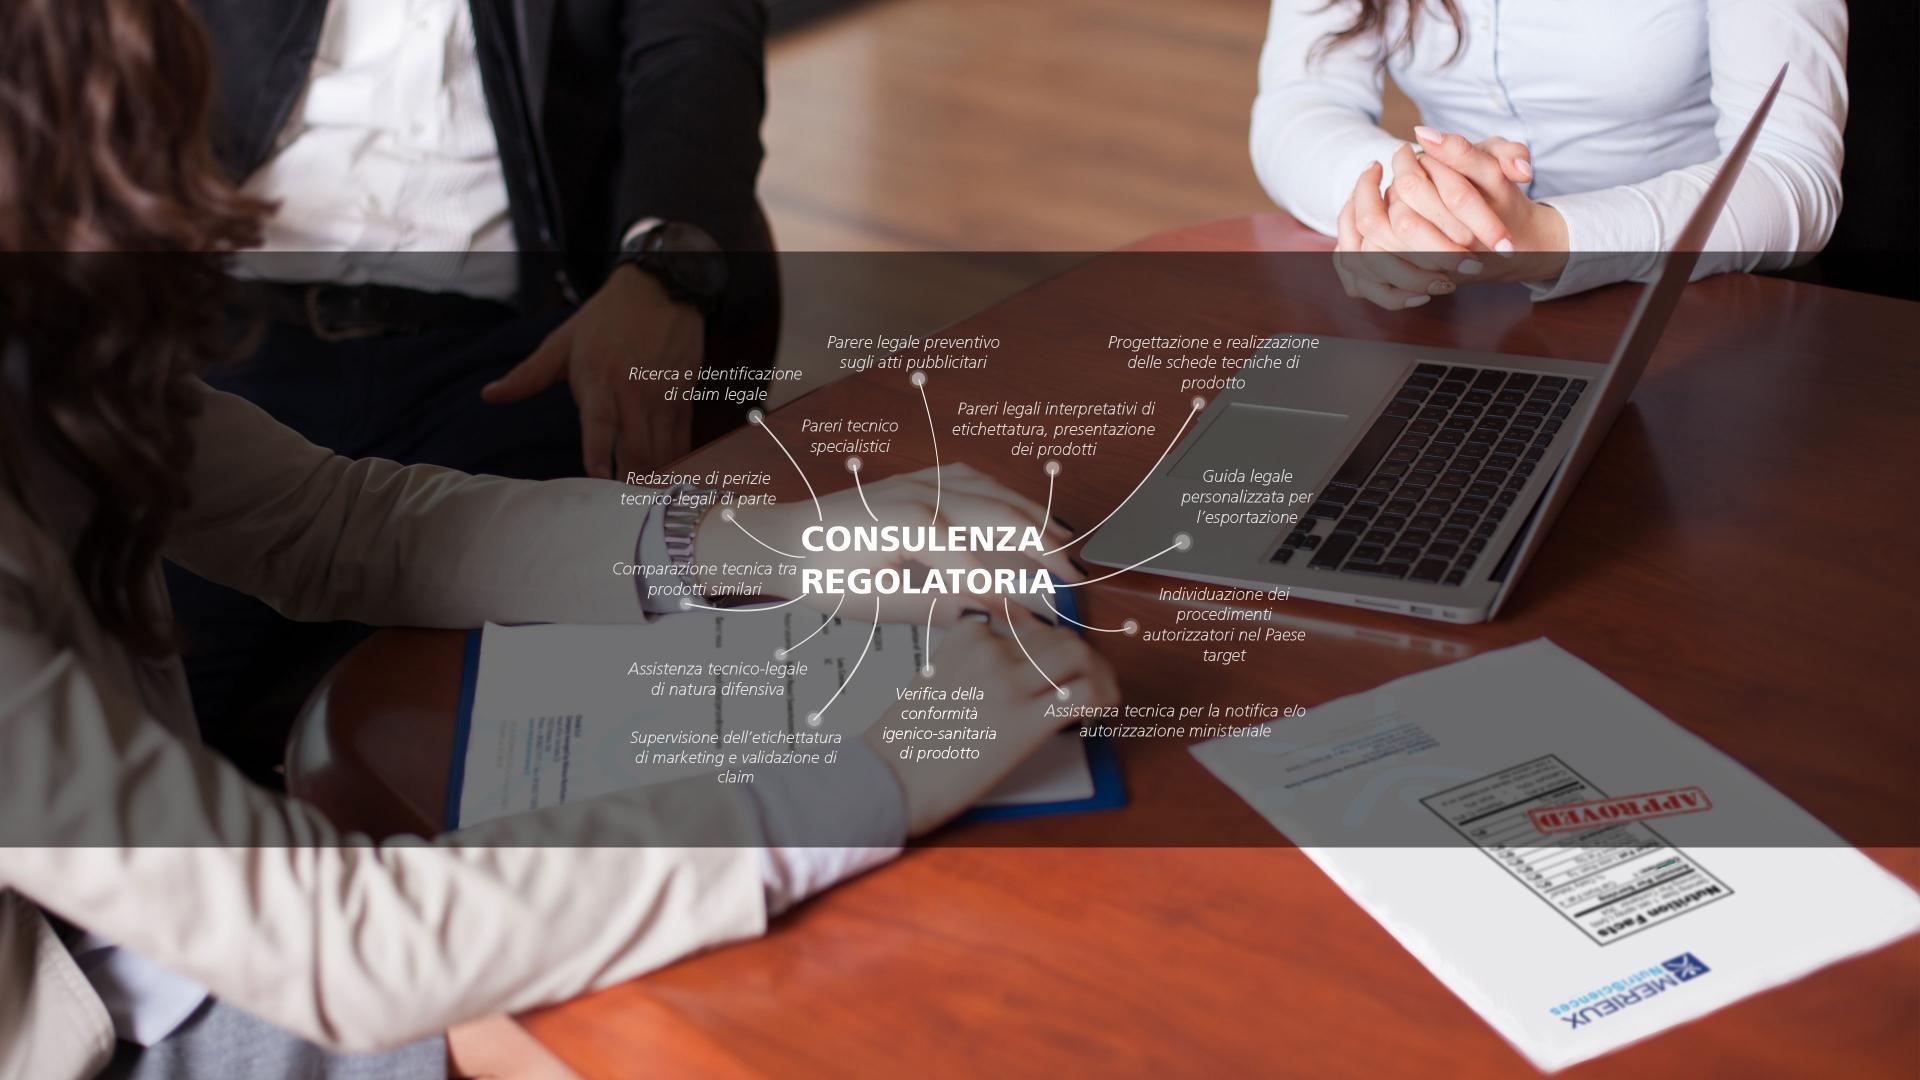 Mérieux NutriSciences-labeling and Regulatory-Regulatory Consultancy-ITA